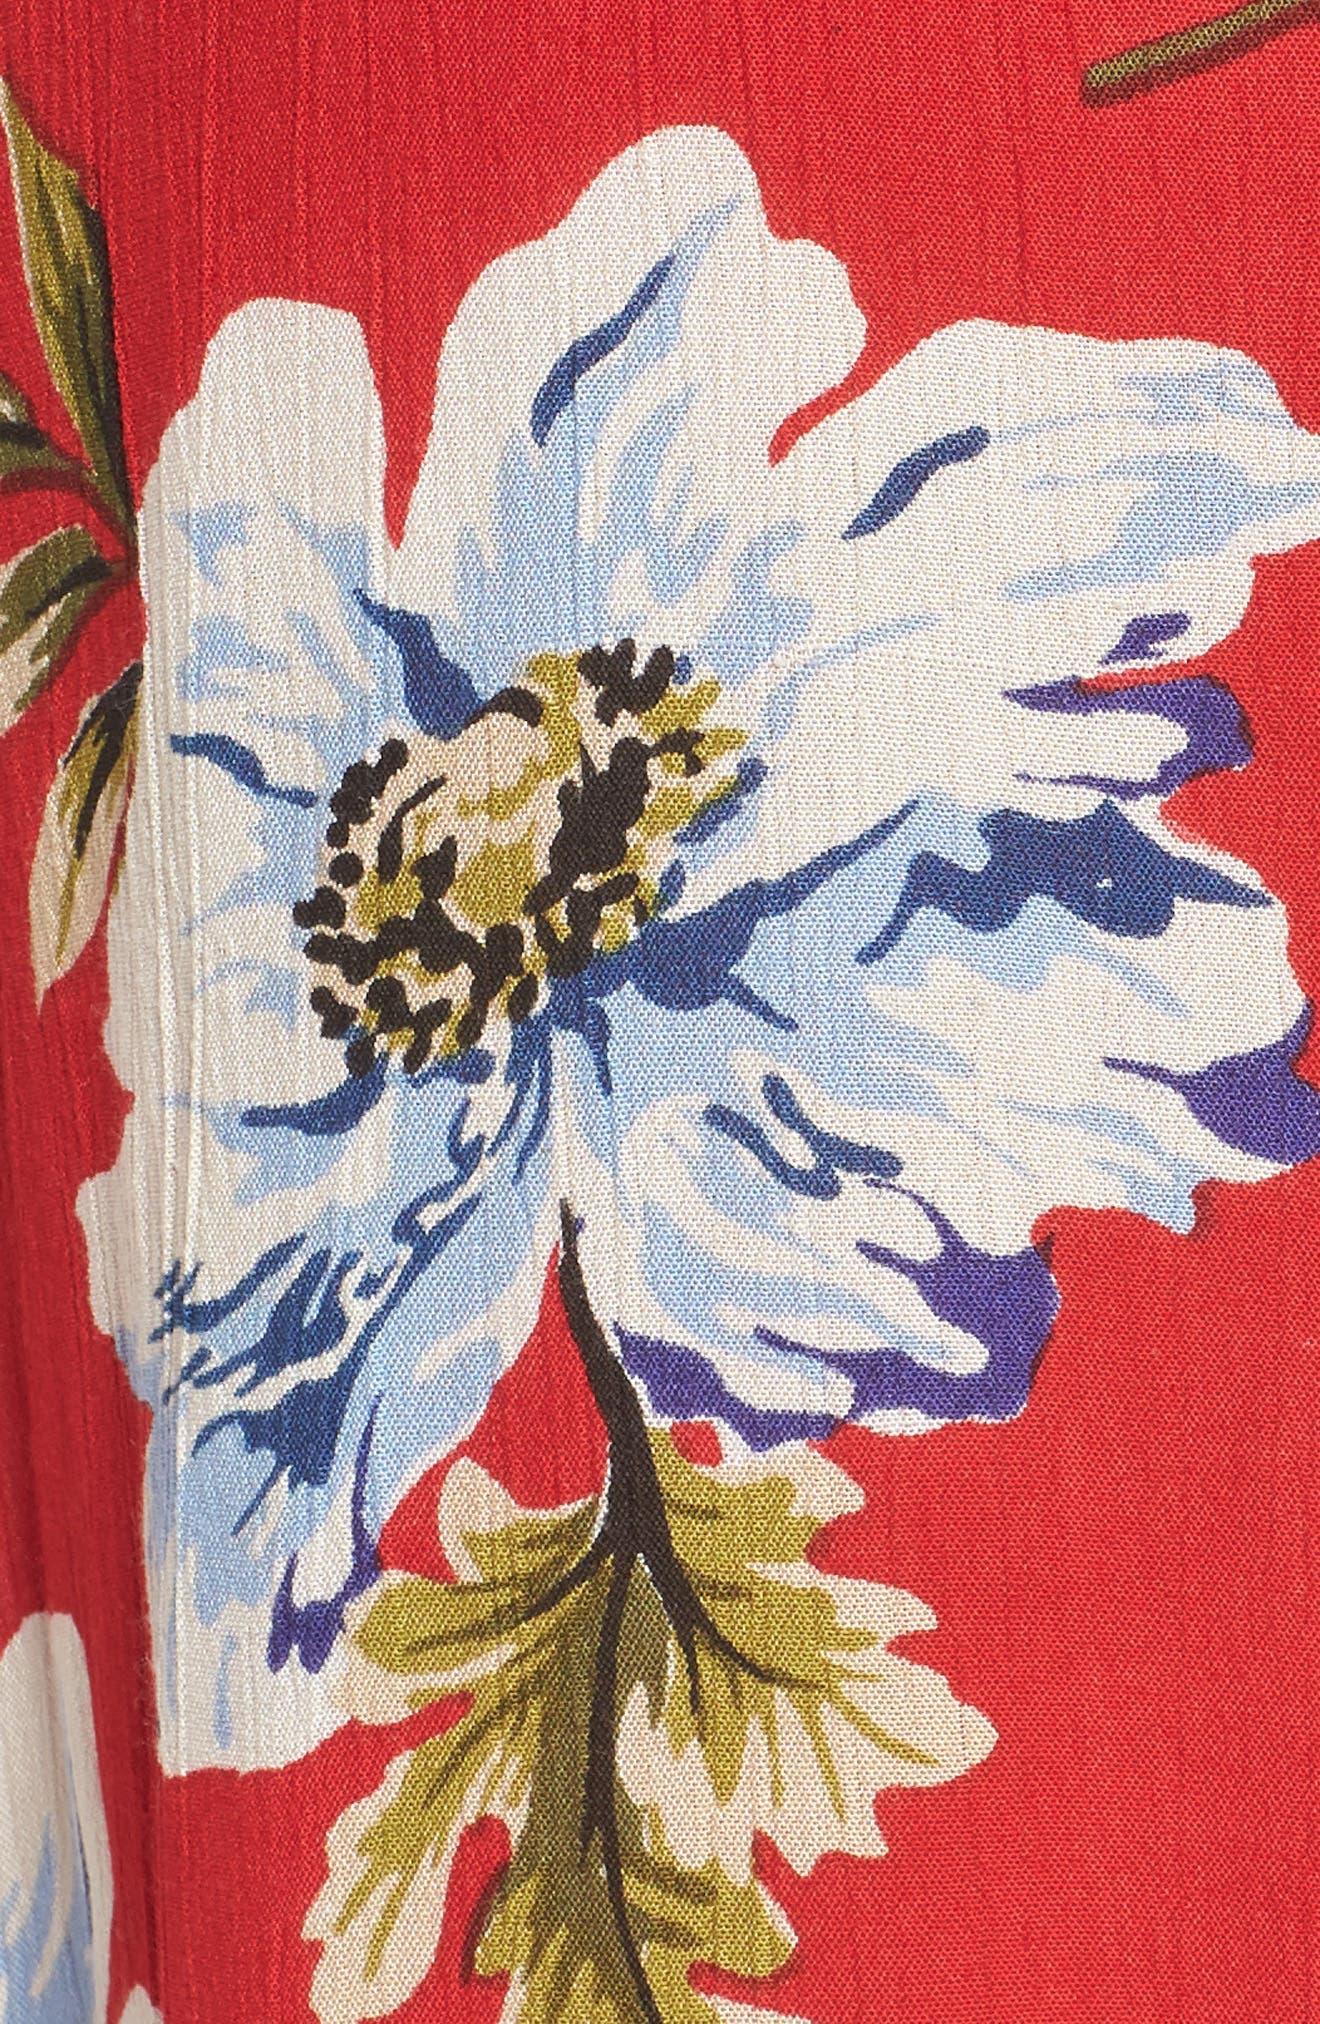 Blue Moon Floral Print Wrap Dress,                             Alternate thumbnail 6, color,                             Red/ Sky